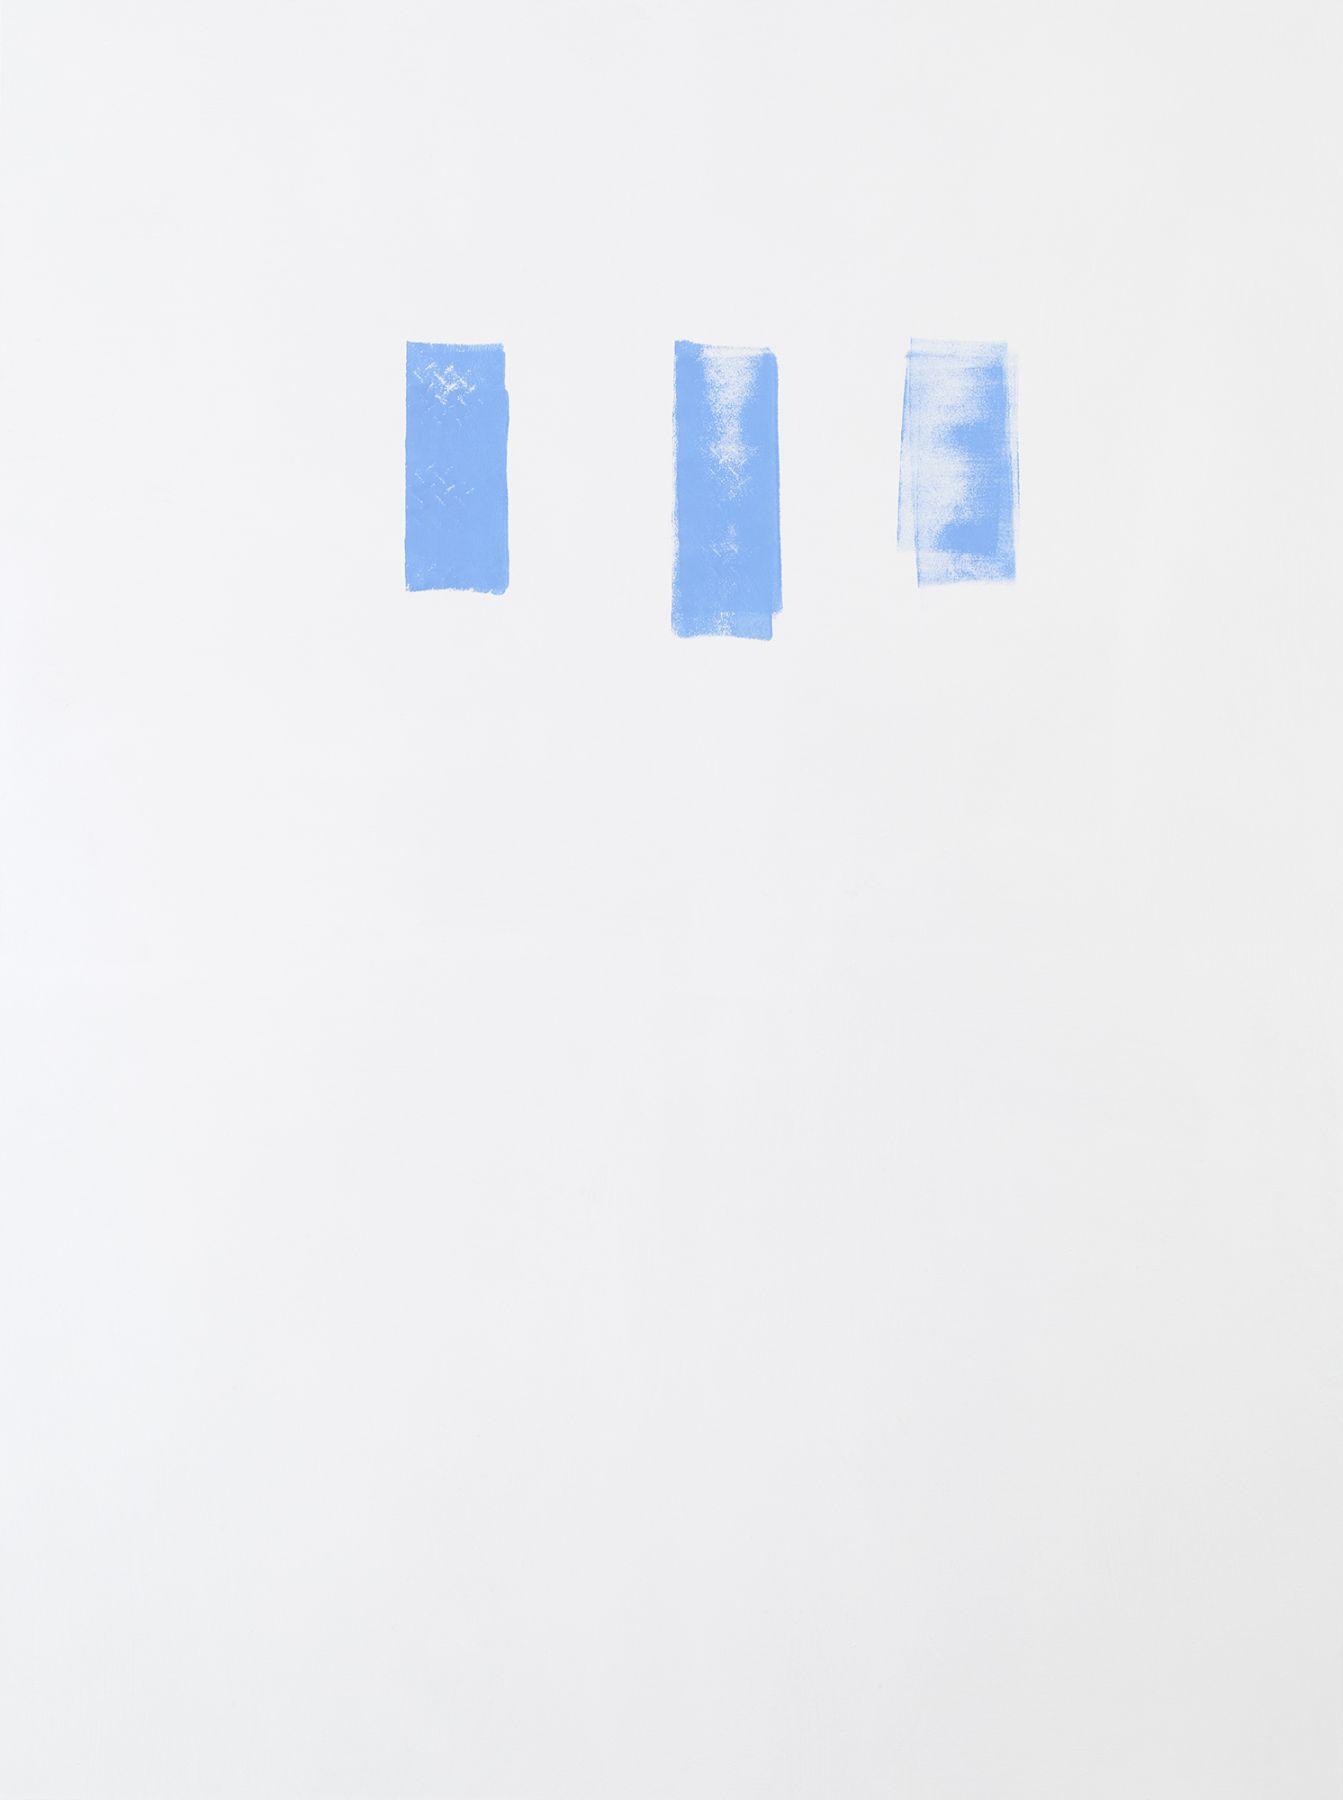 Michael Krebber MK.301, 2015 Acrylic on canvas  78 3/4 x 59 1/8 inches (200 x 150.2 cm)